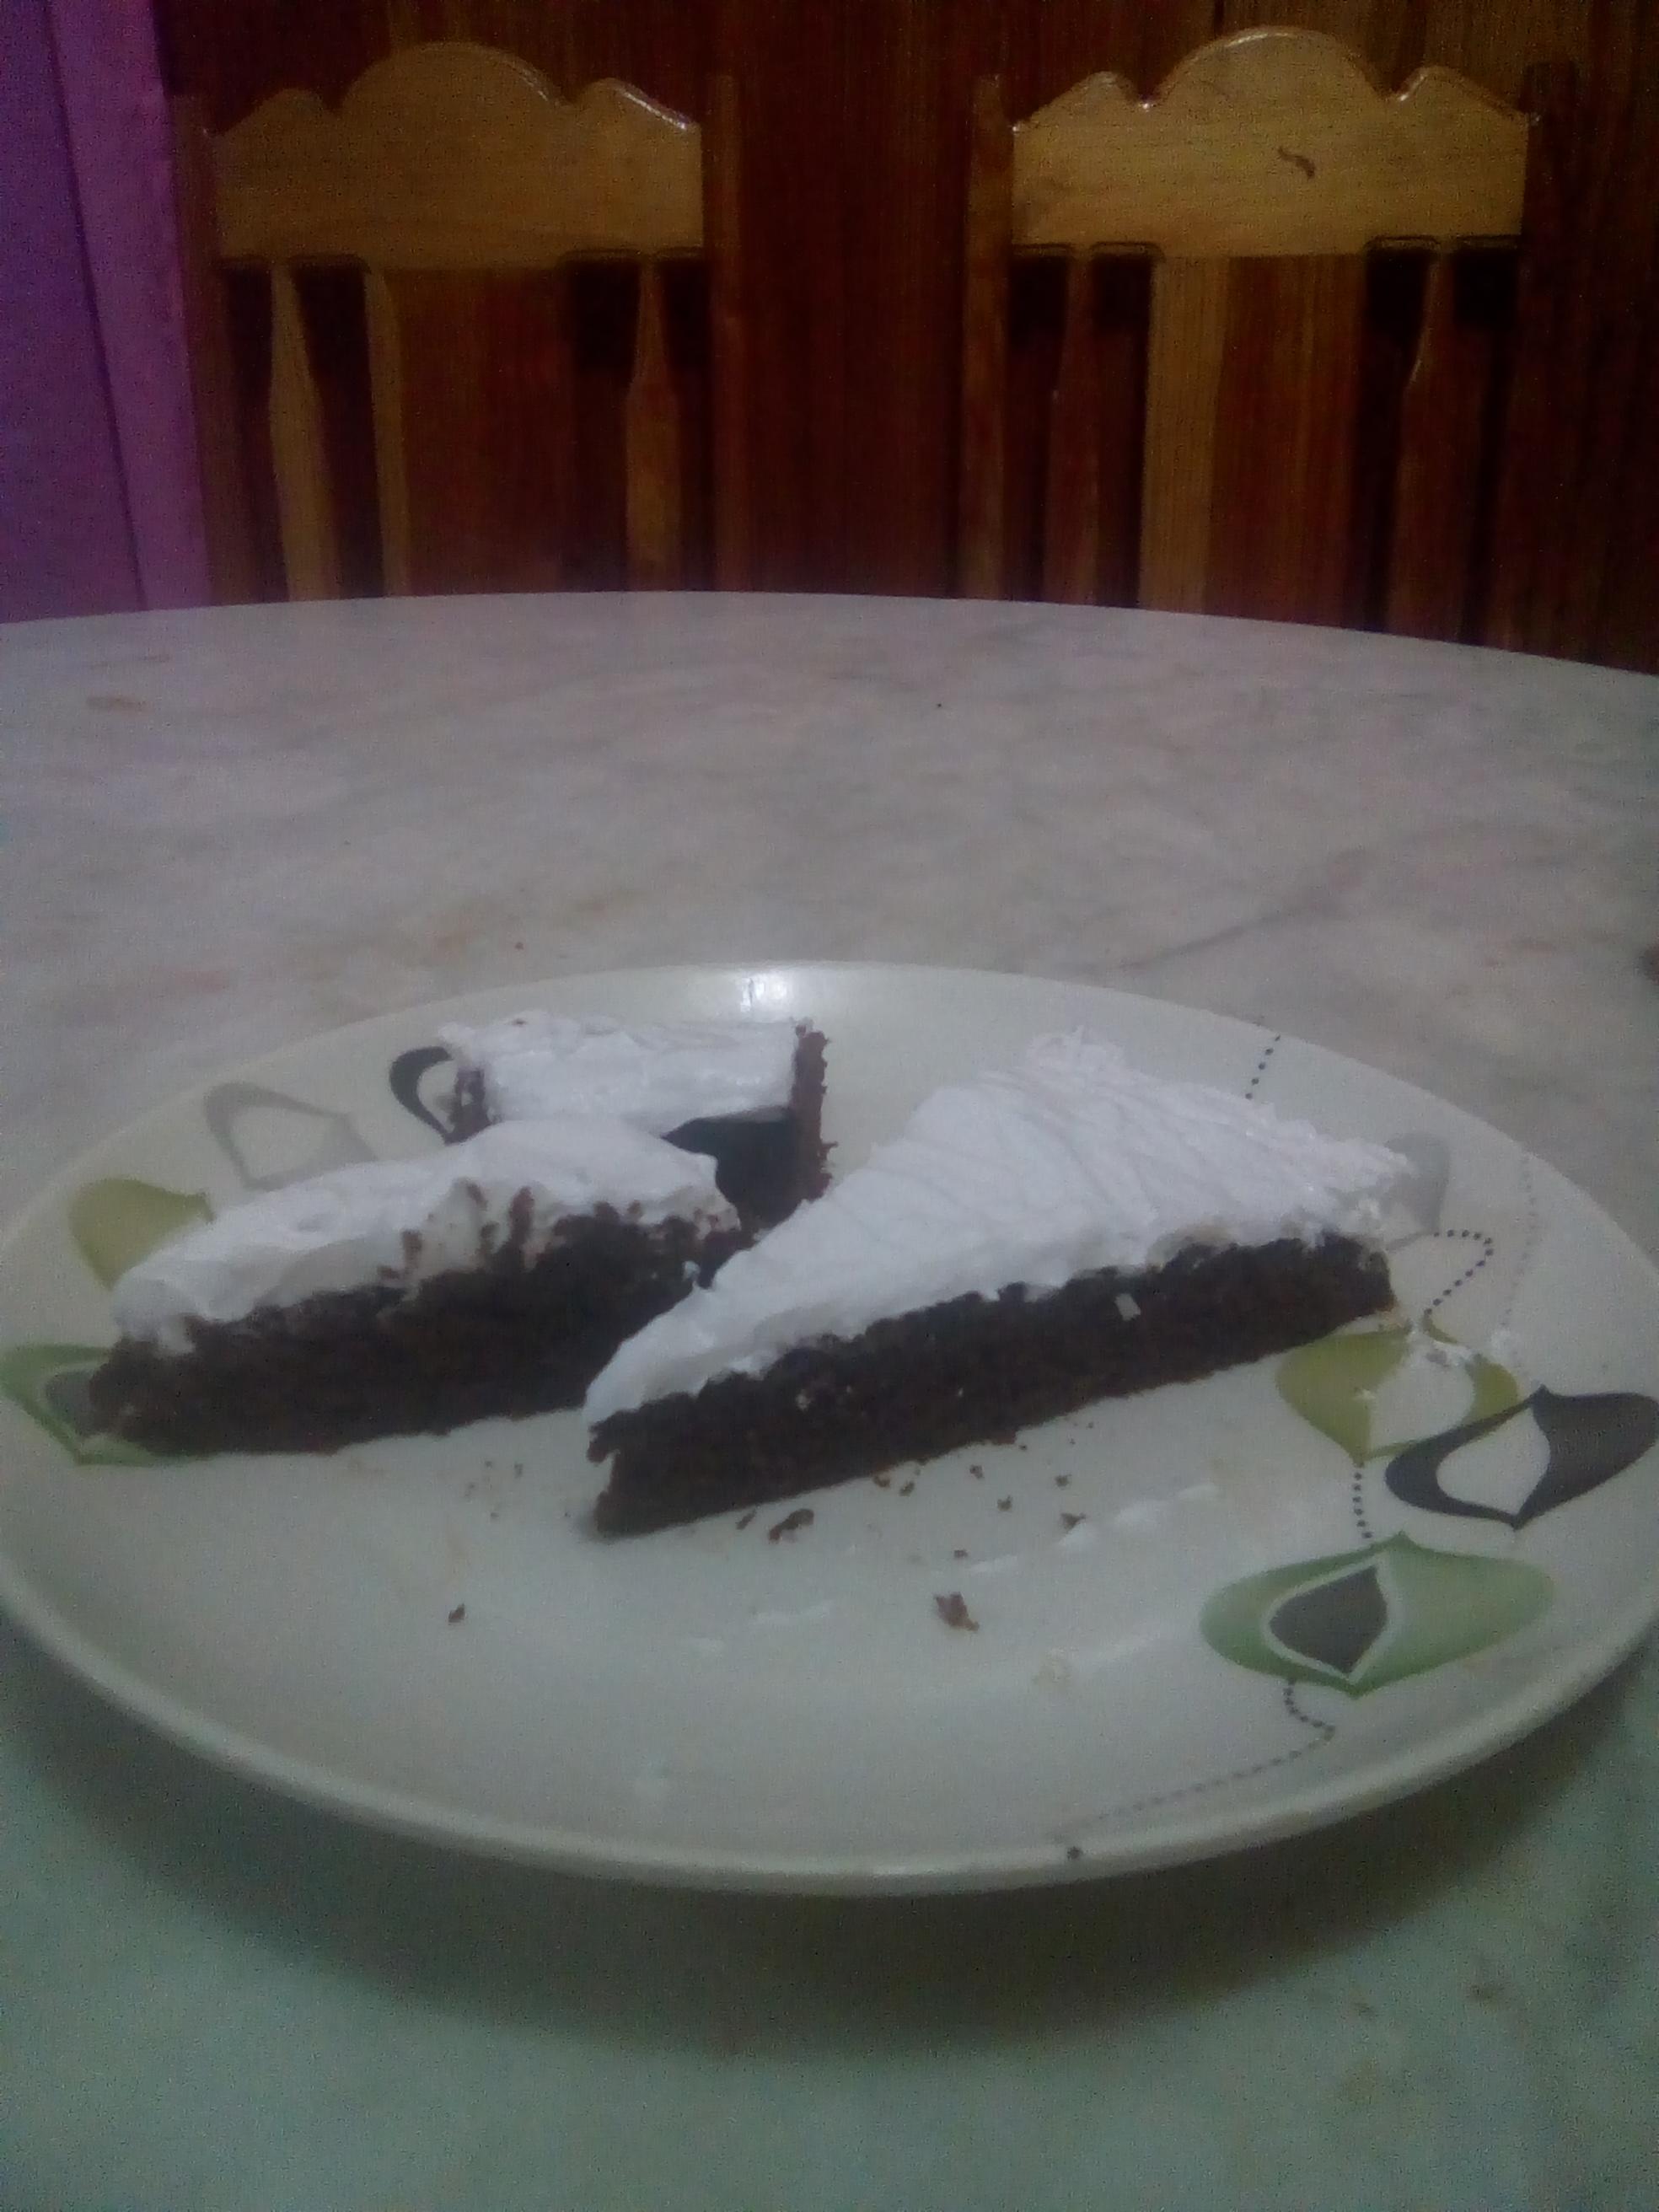 Wacky Cake VIII Alyson Banagao